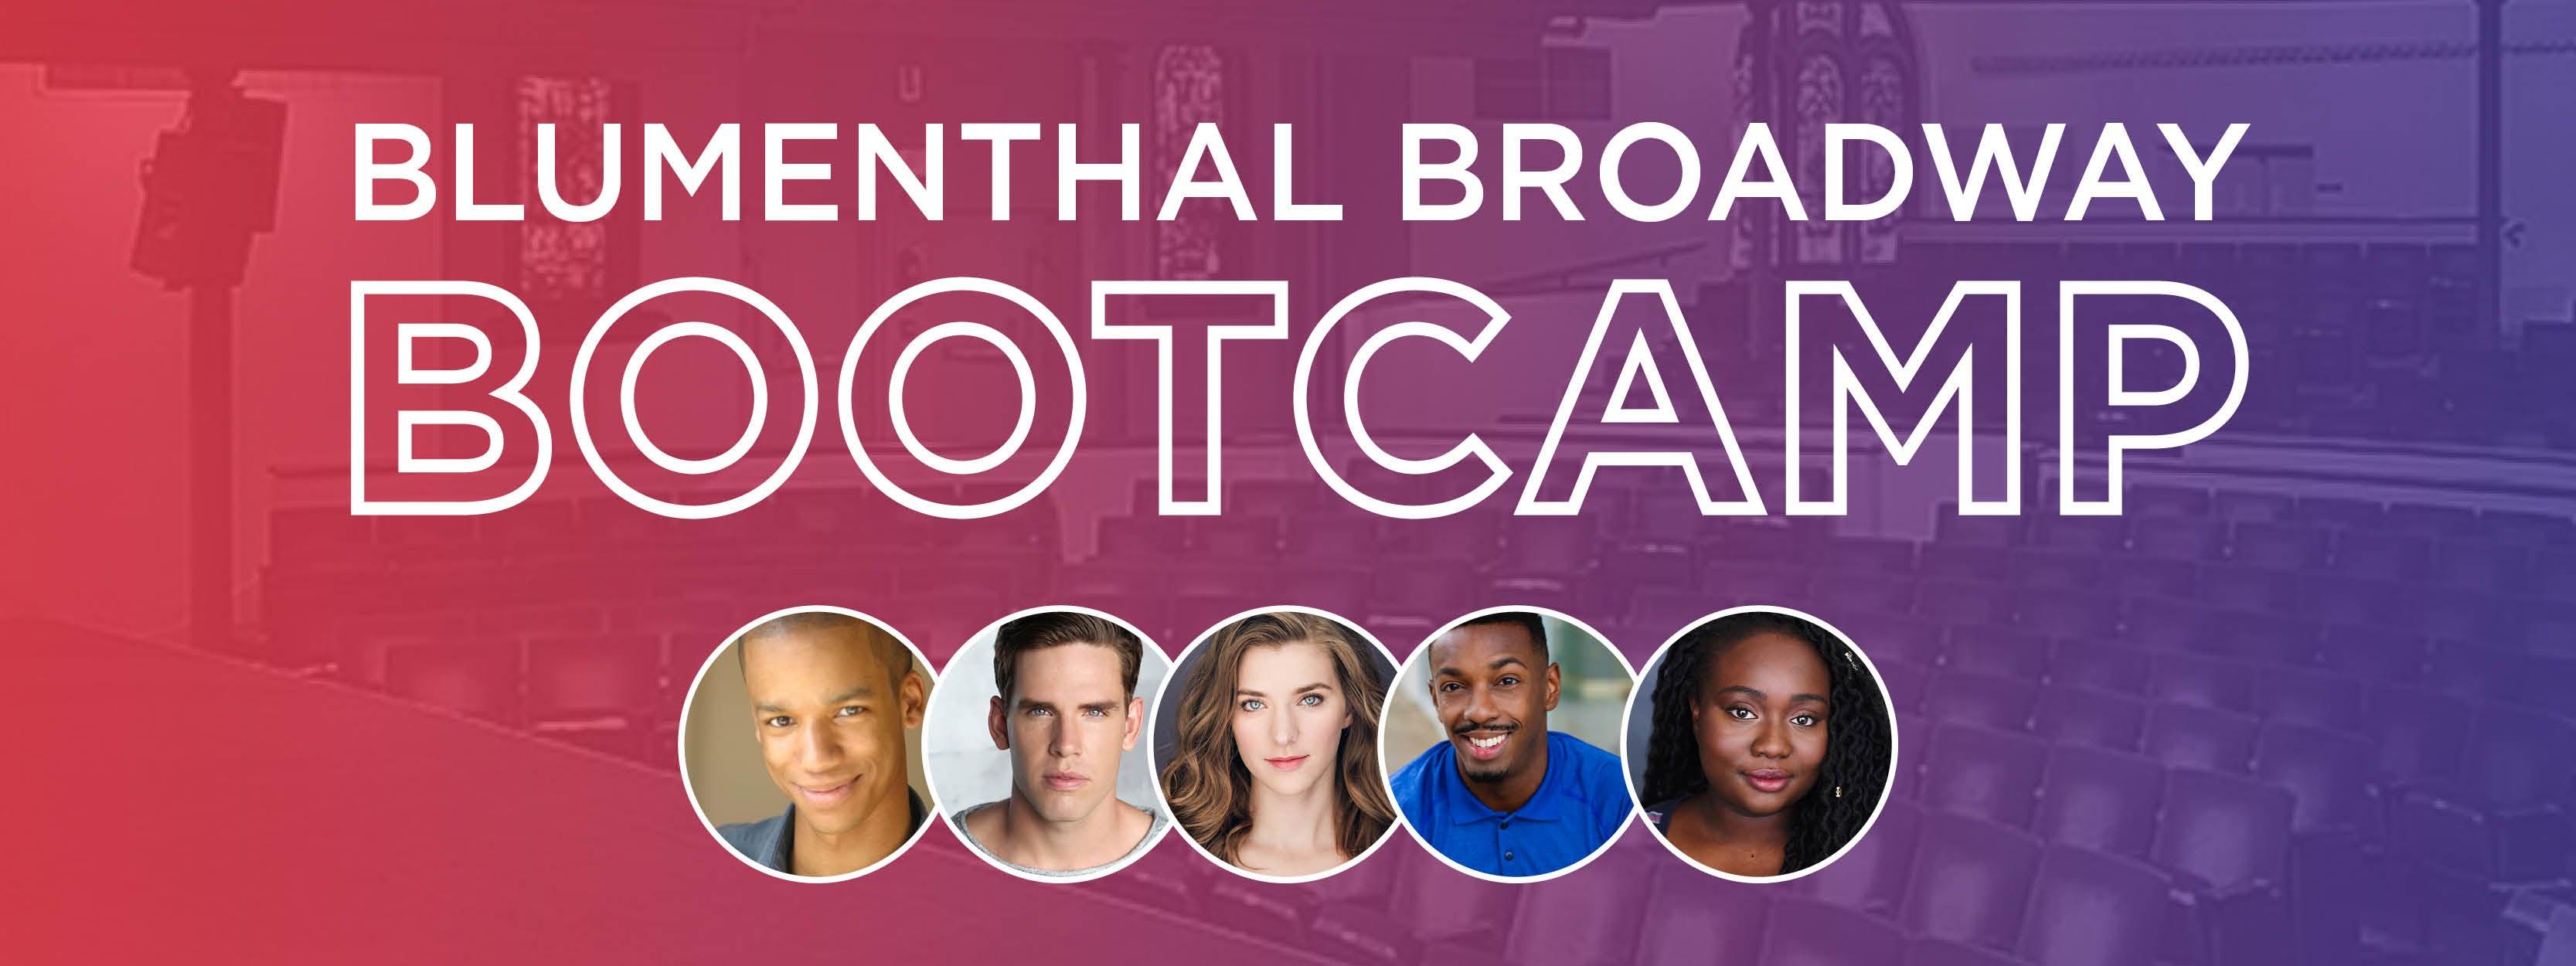 Blumenthal Broadway Bootcamp